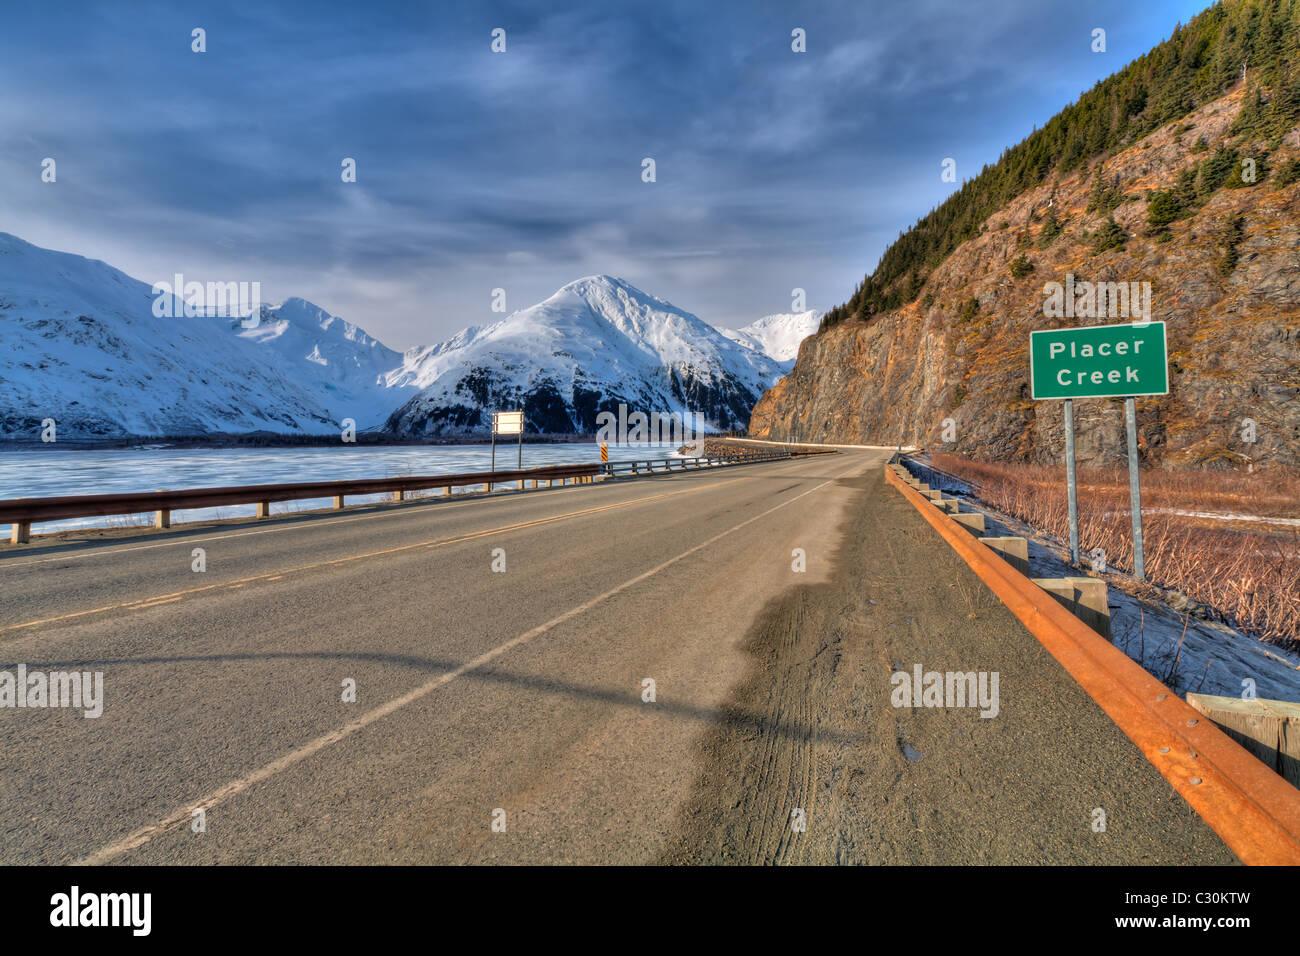 Portage Lake and Portage Glacier Road Bridge over Placer Creek Alaska HDR - Stock Image